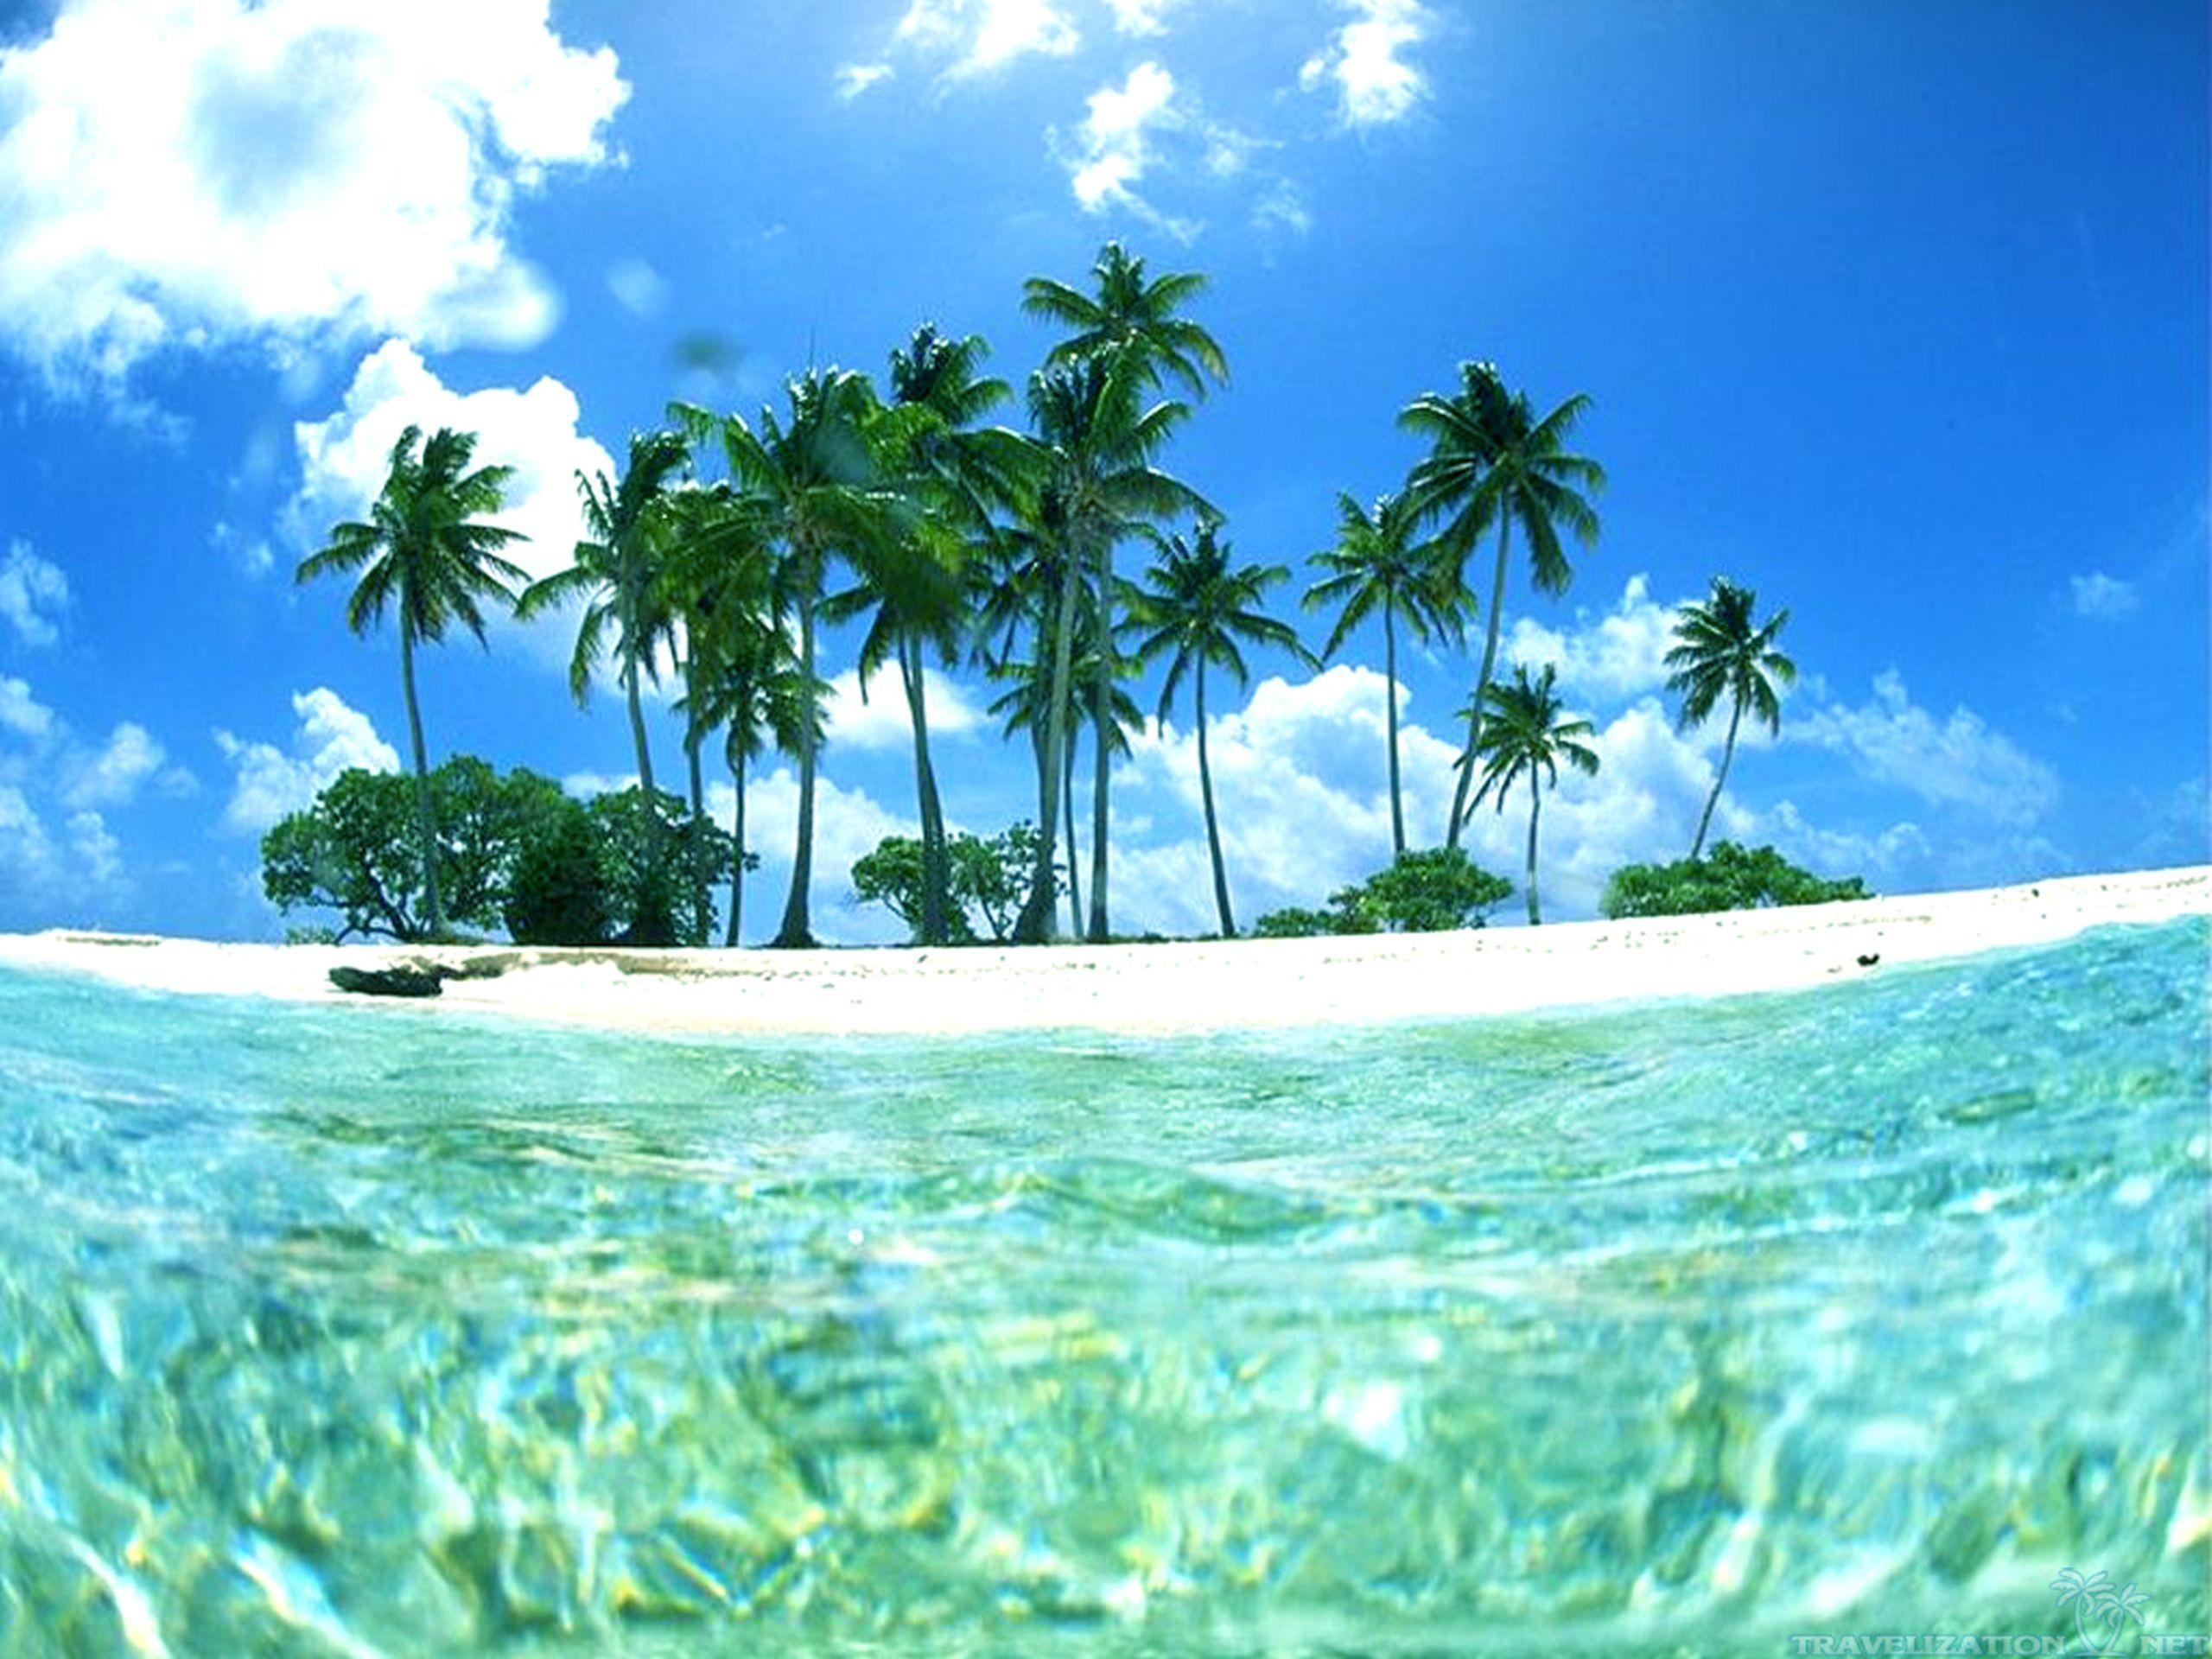 Best Wallpaper Macbook Tropical - 791002-tropical-background-images-2560x1920-macbook  Photograph_364483.jpg